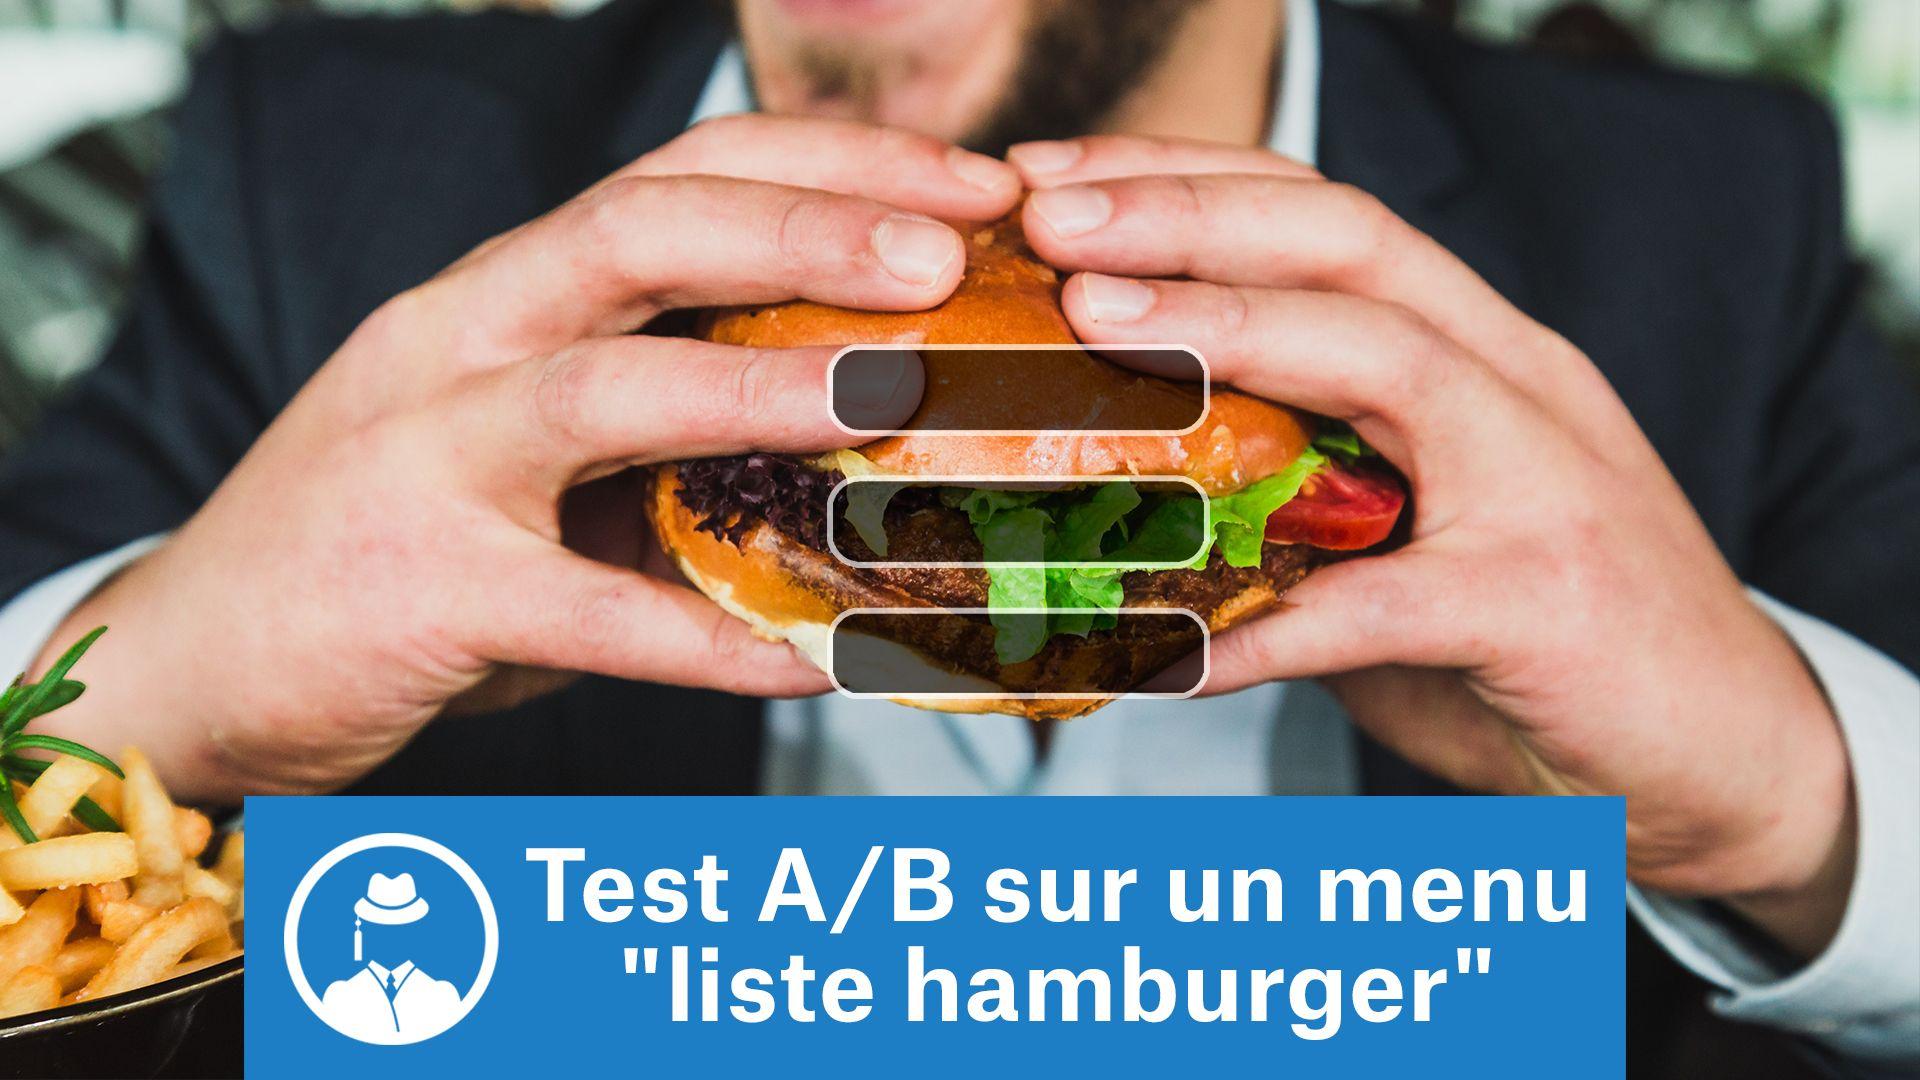 "Test A/B sur un menu ""liste hamburger"" #GrowthHacking #WebMarketing #FormationGrowthHacking #CentreDeFormationFrance #TunnelAARRR #AARRR #SocialMedia #CommunityManagement #SEO #MarketingDigital #SiteWeb #testAB #ABtesting"